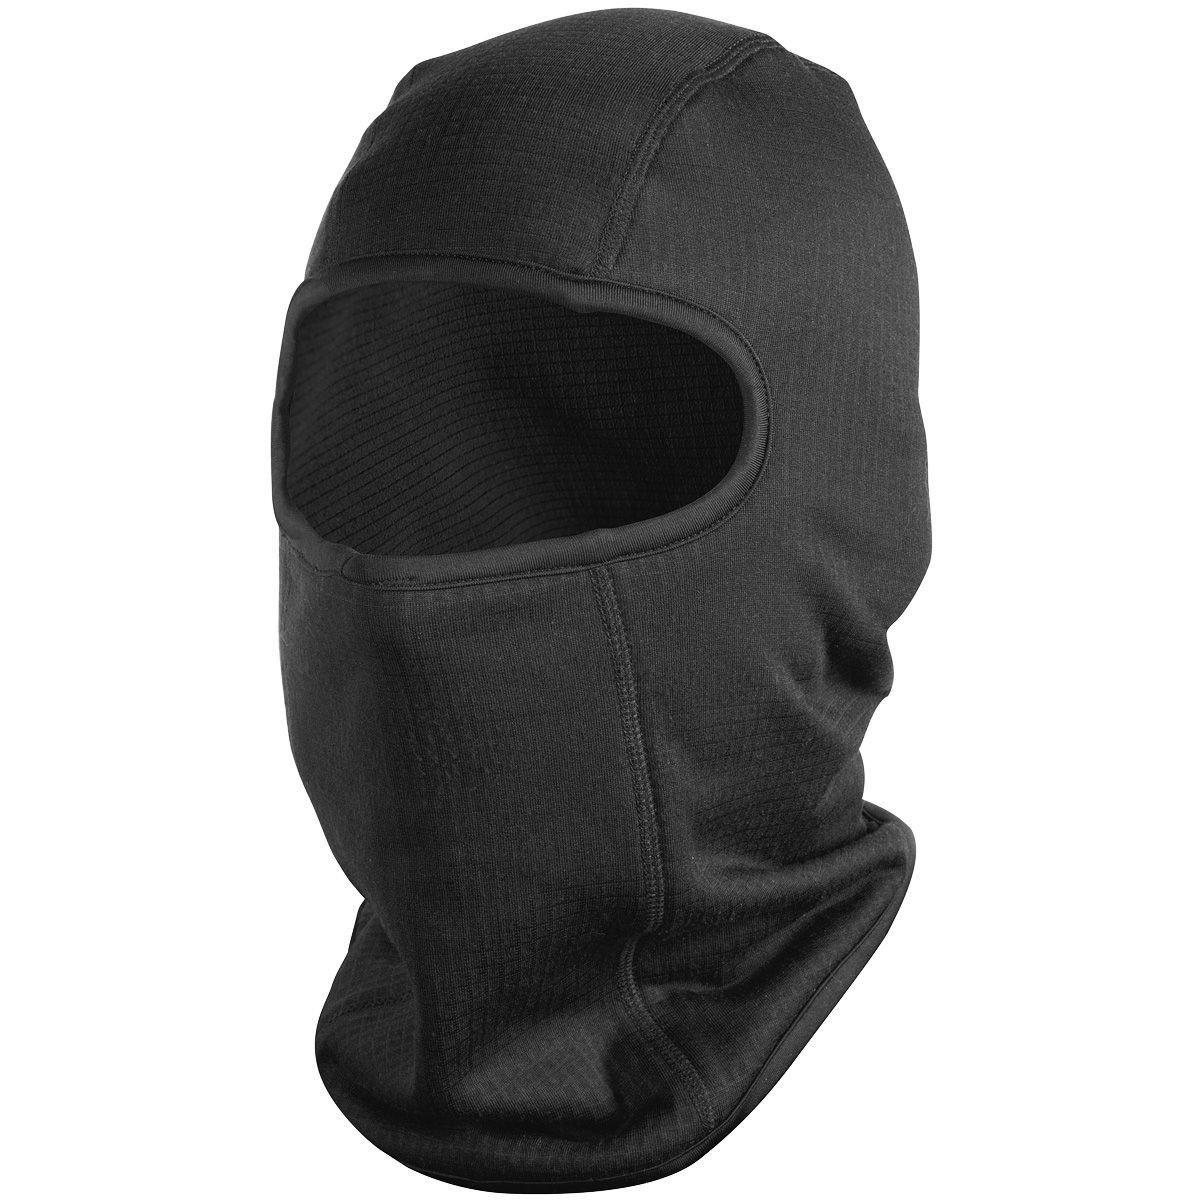 Утеплённая зимняя Балаклава, подшлемник  - Термо маска